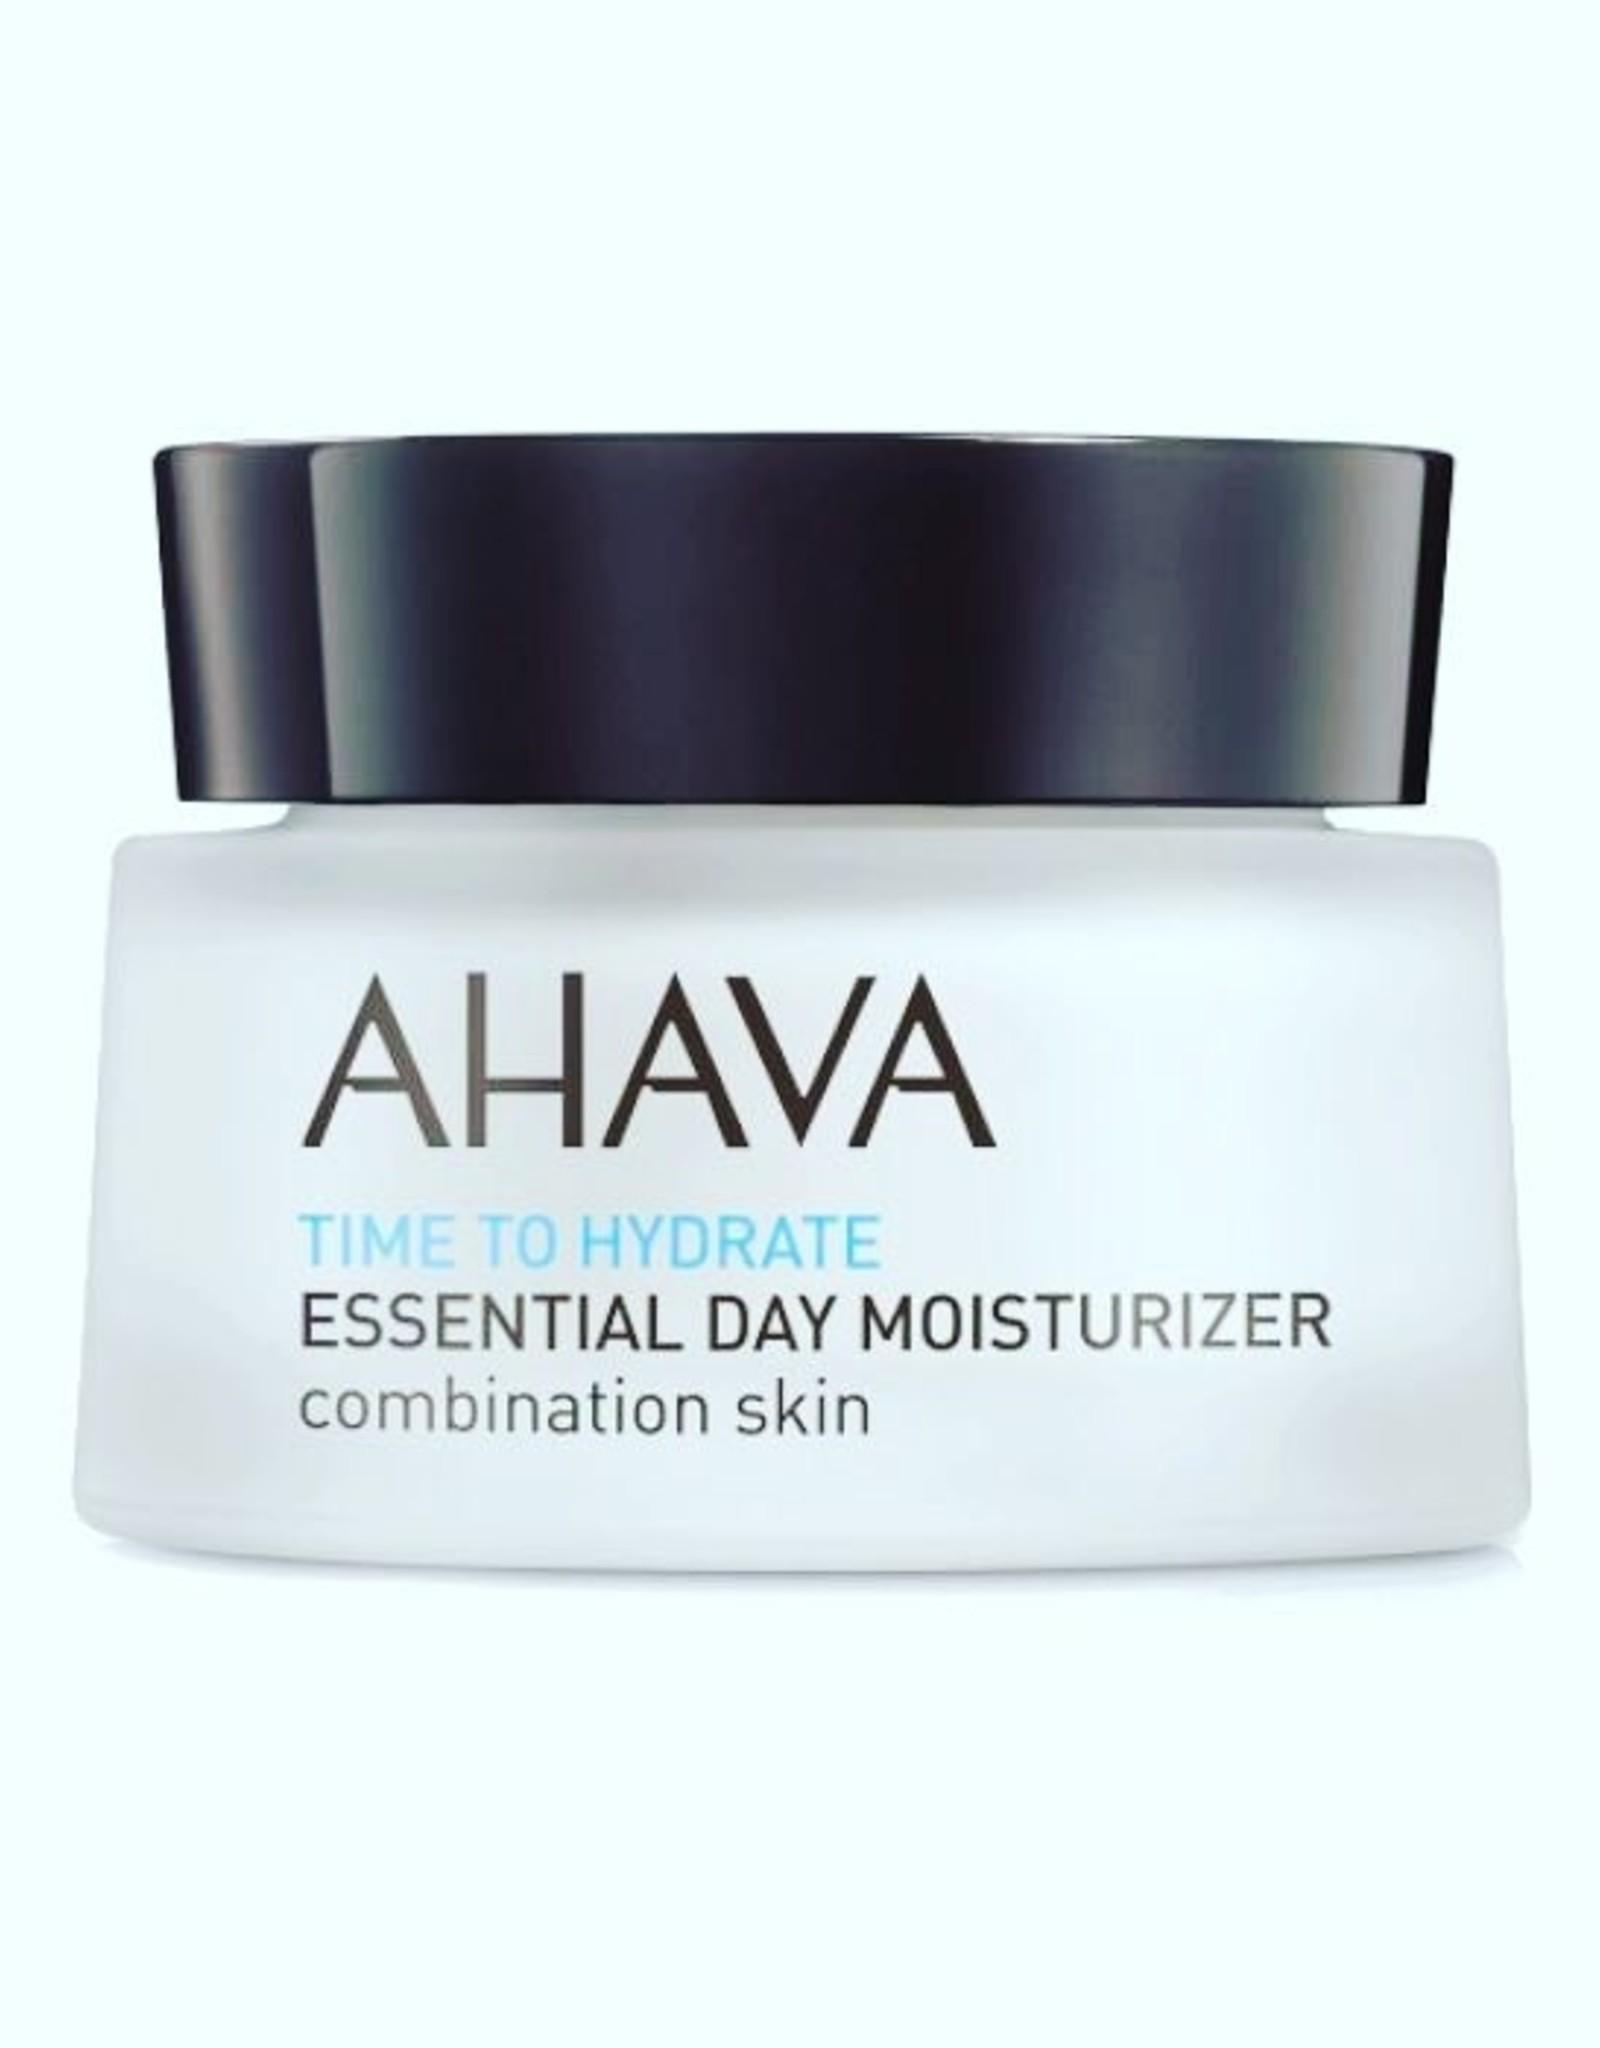 AHAVA essential day moisterizer combination skin 50ml